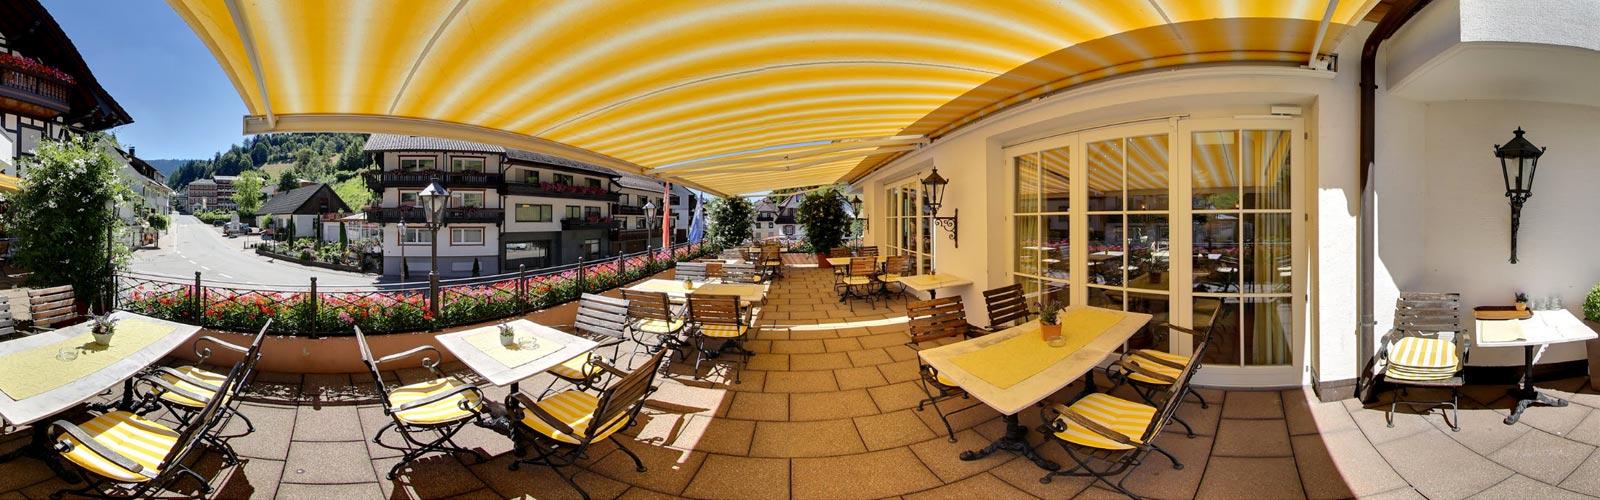 Adlerbad-Flair-Hotel-Terasse-1600x500px